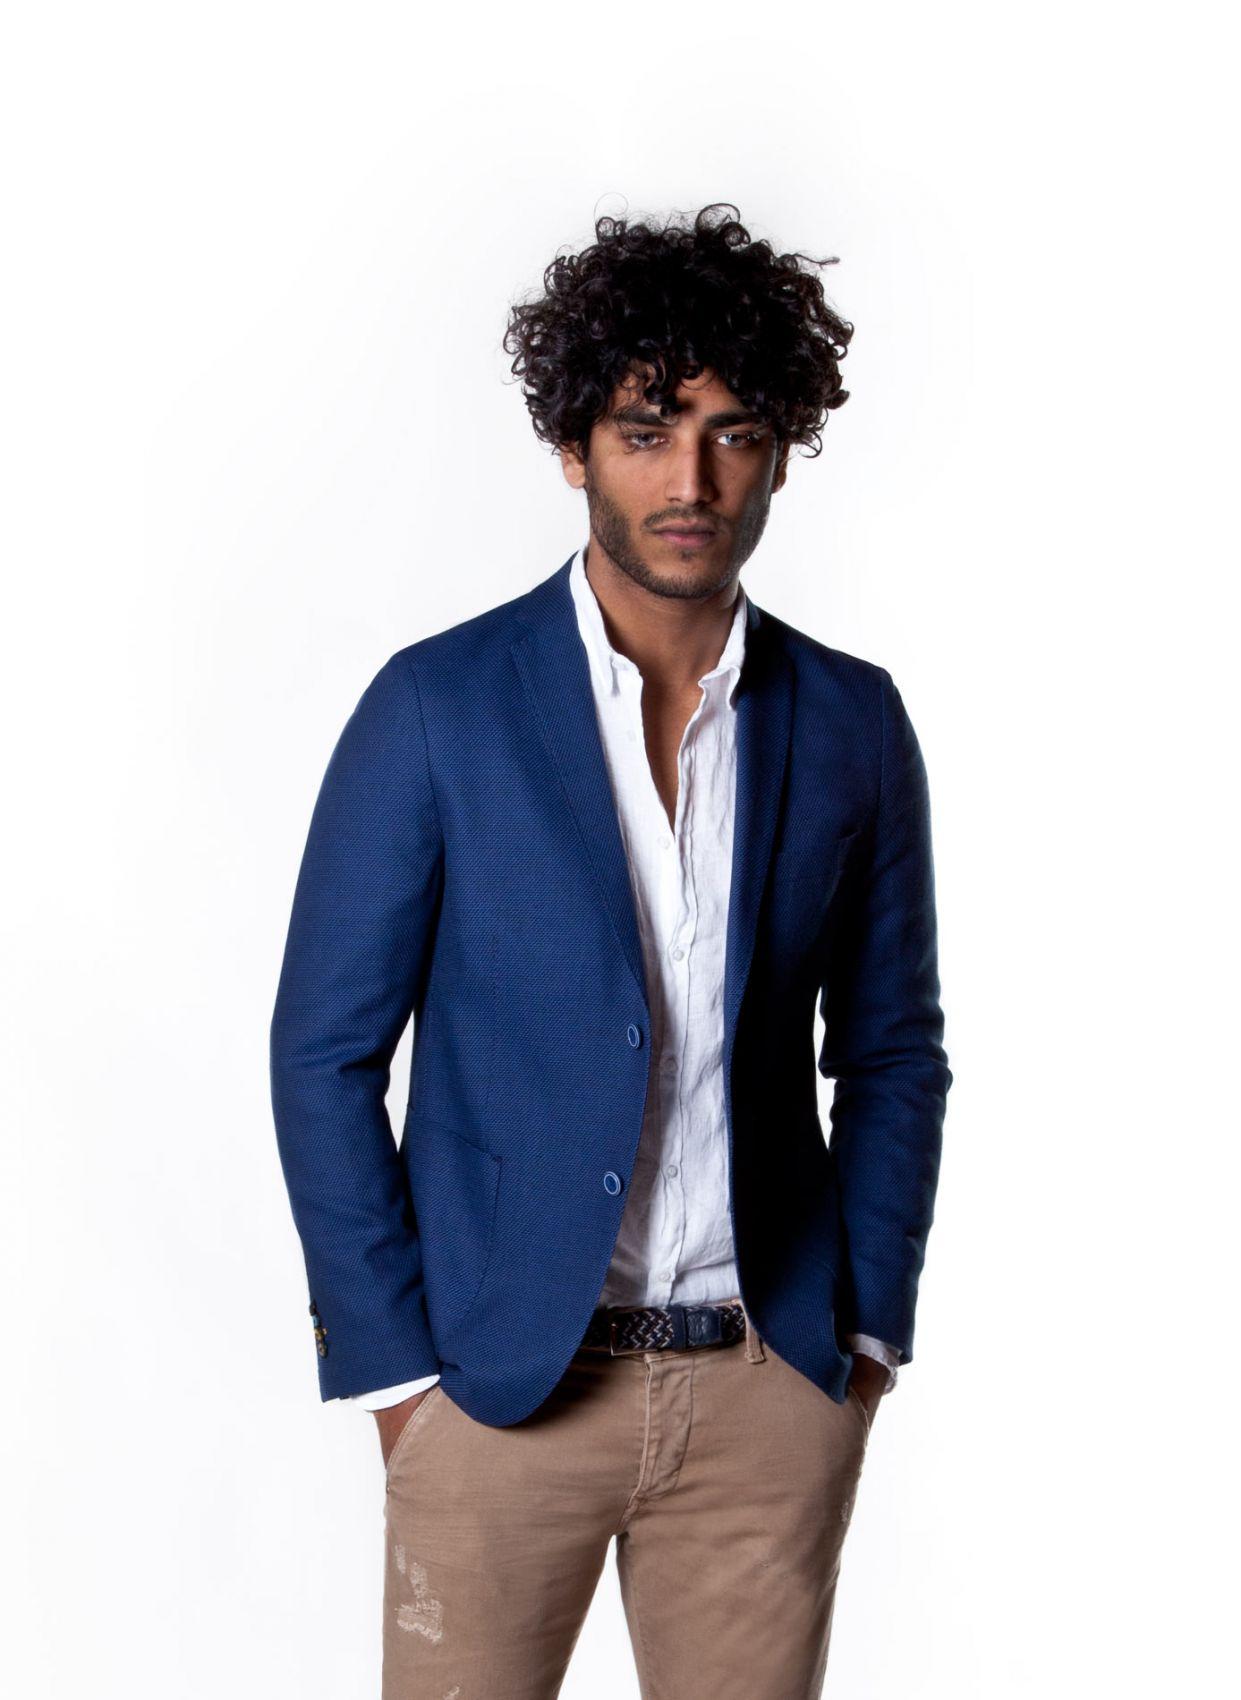 Giacca moda uomo slim fit in cotone lino John Barritt micro fantasia ... 22145dbd8d9